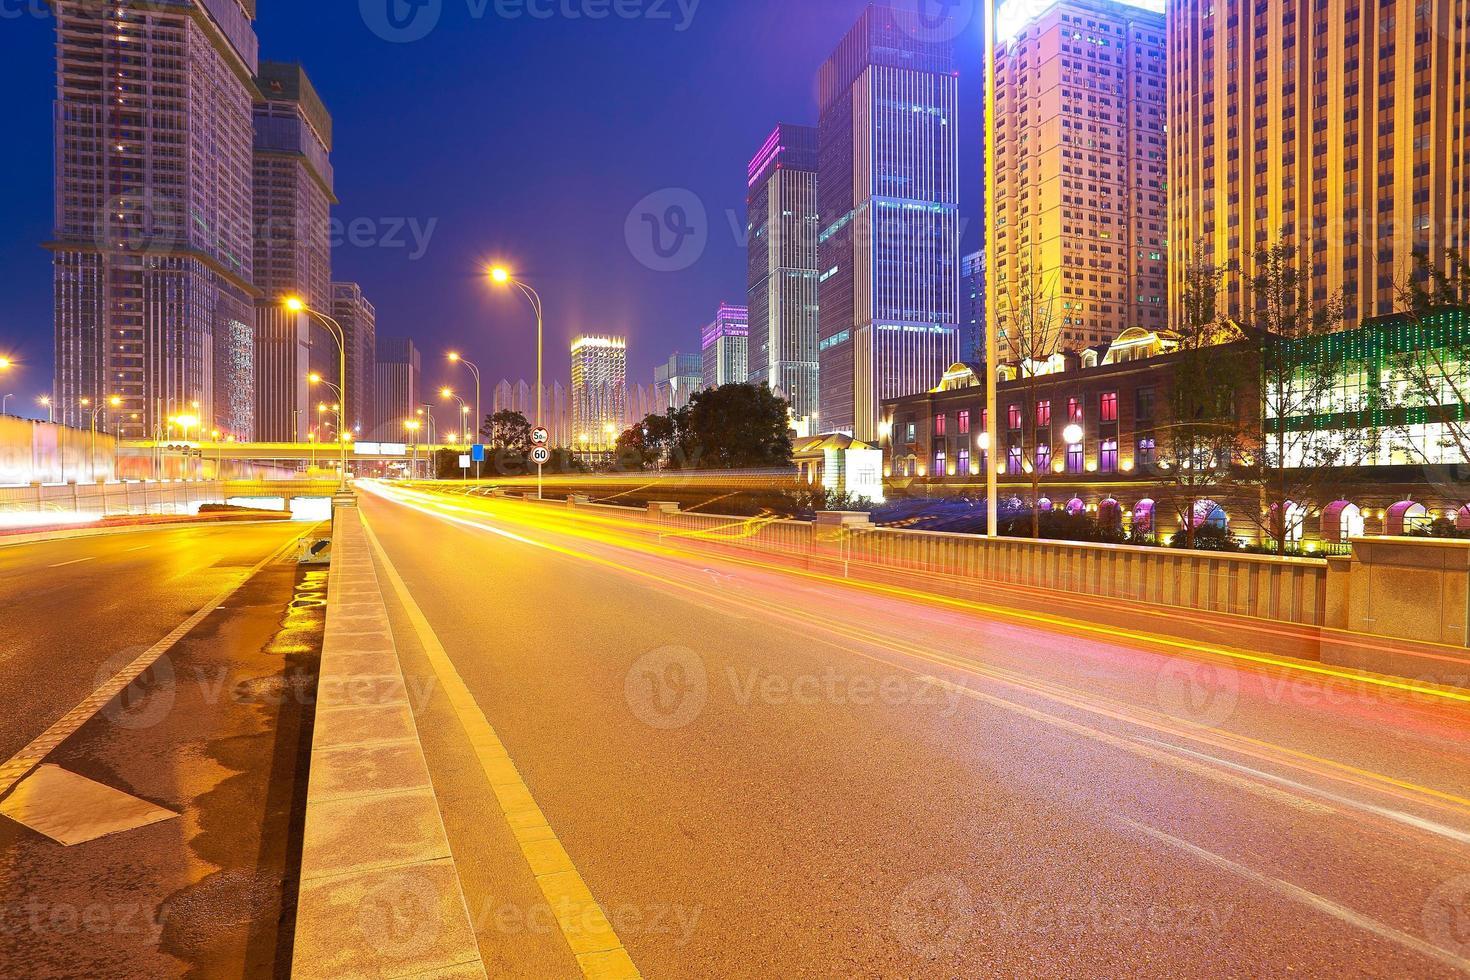 stad bouwen straatbeeld en weg van nachtbeeld foto